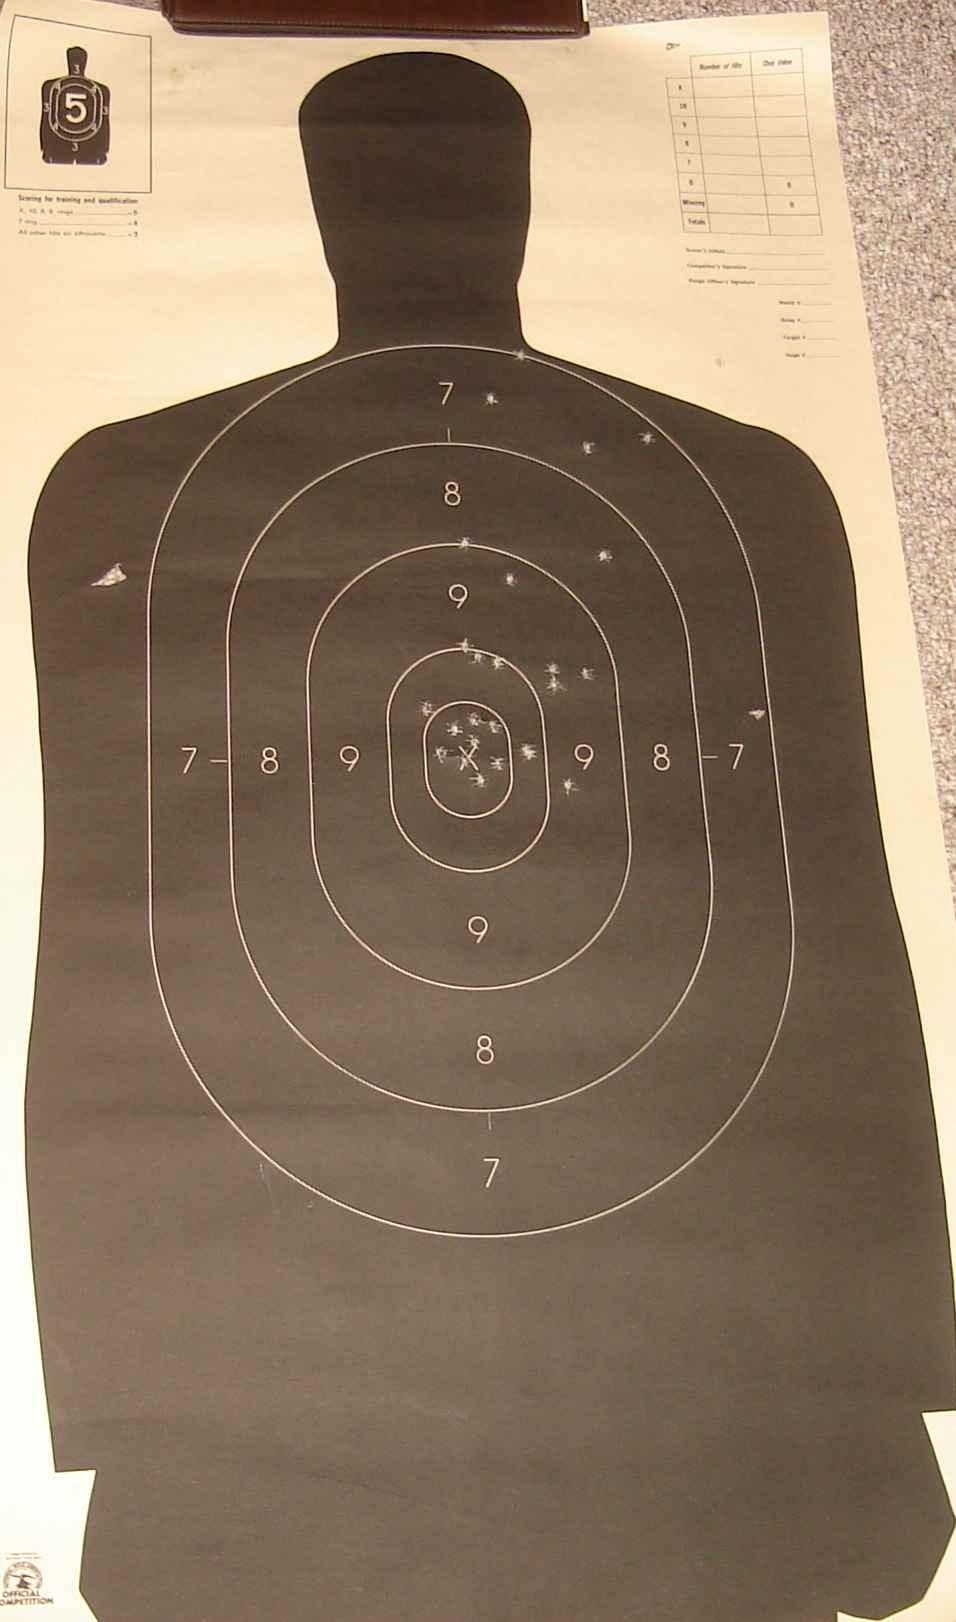 Target August 30 2012